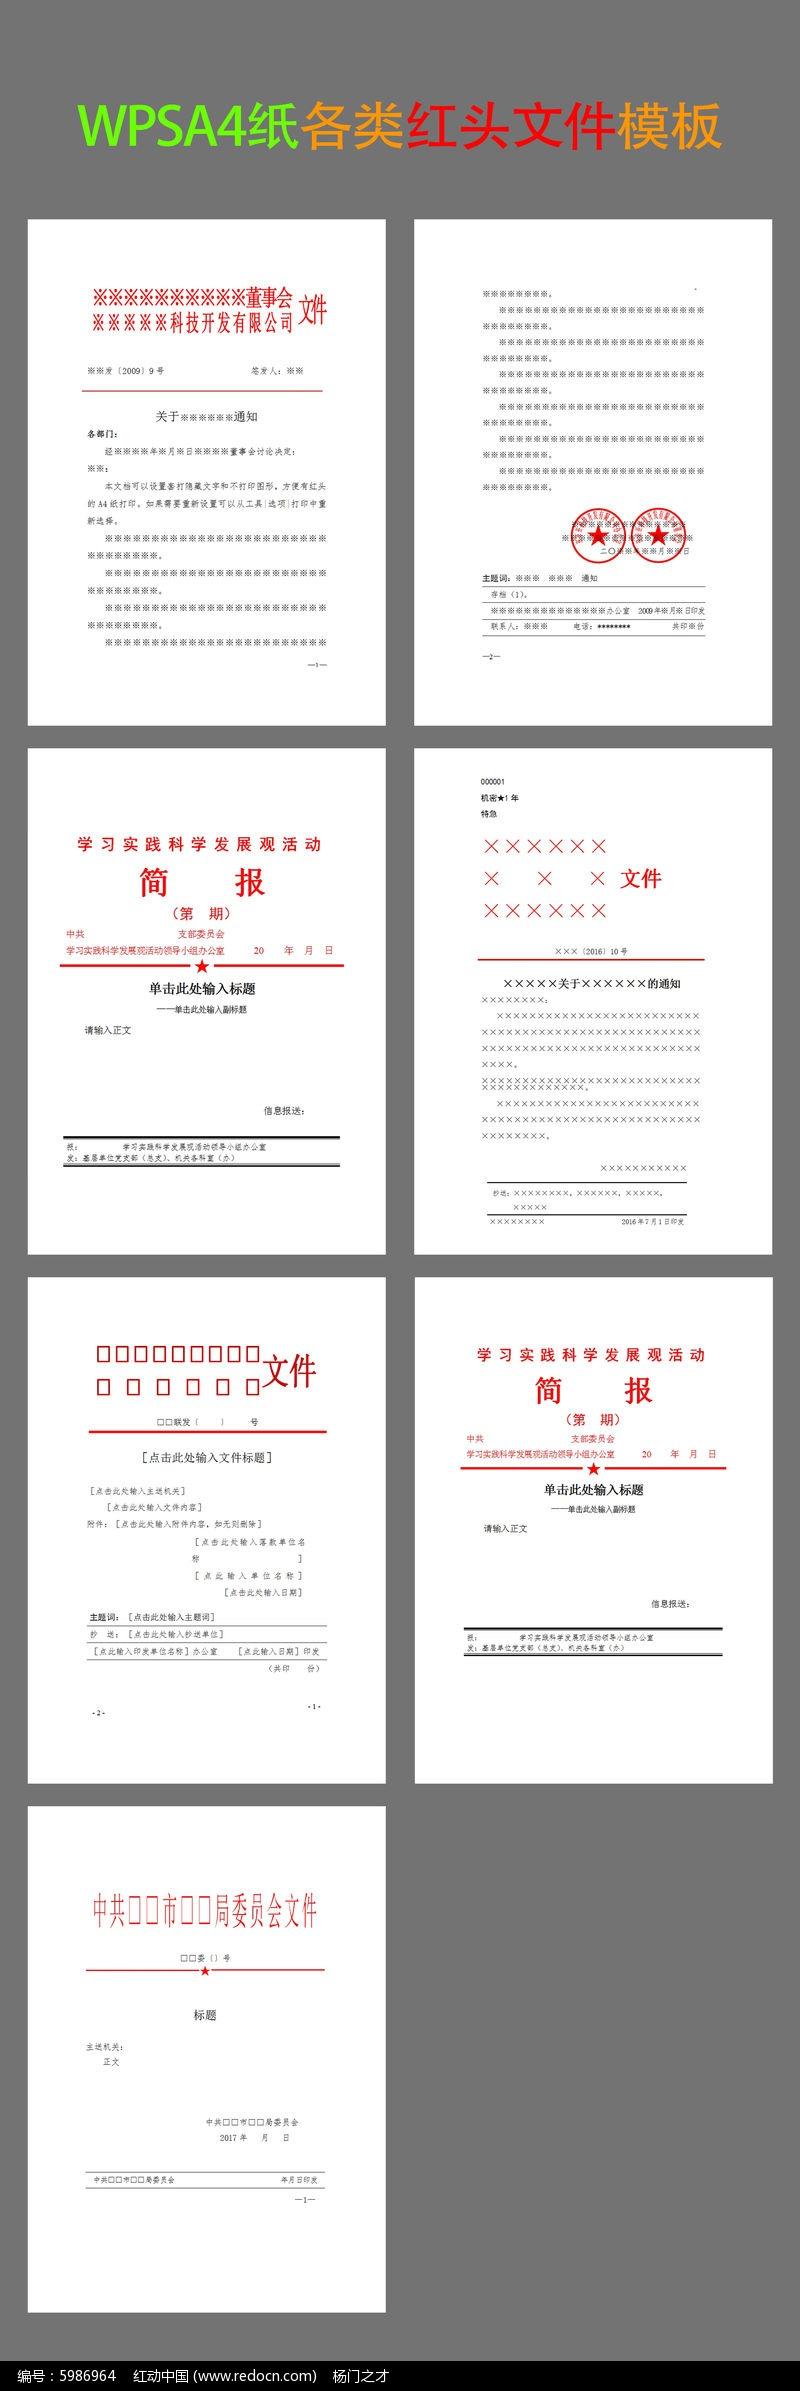 a4纸wps格式各类红头文件模板